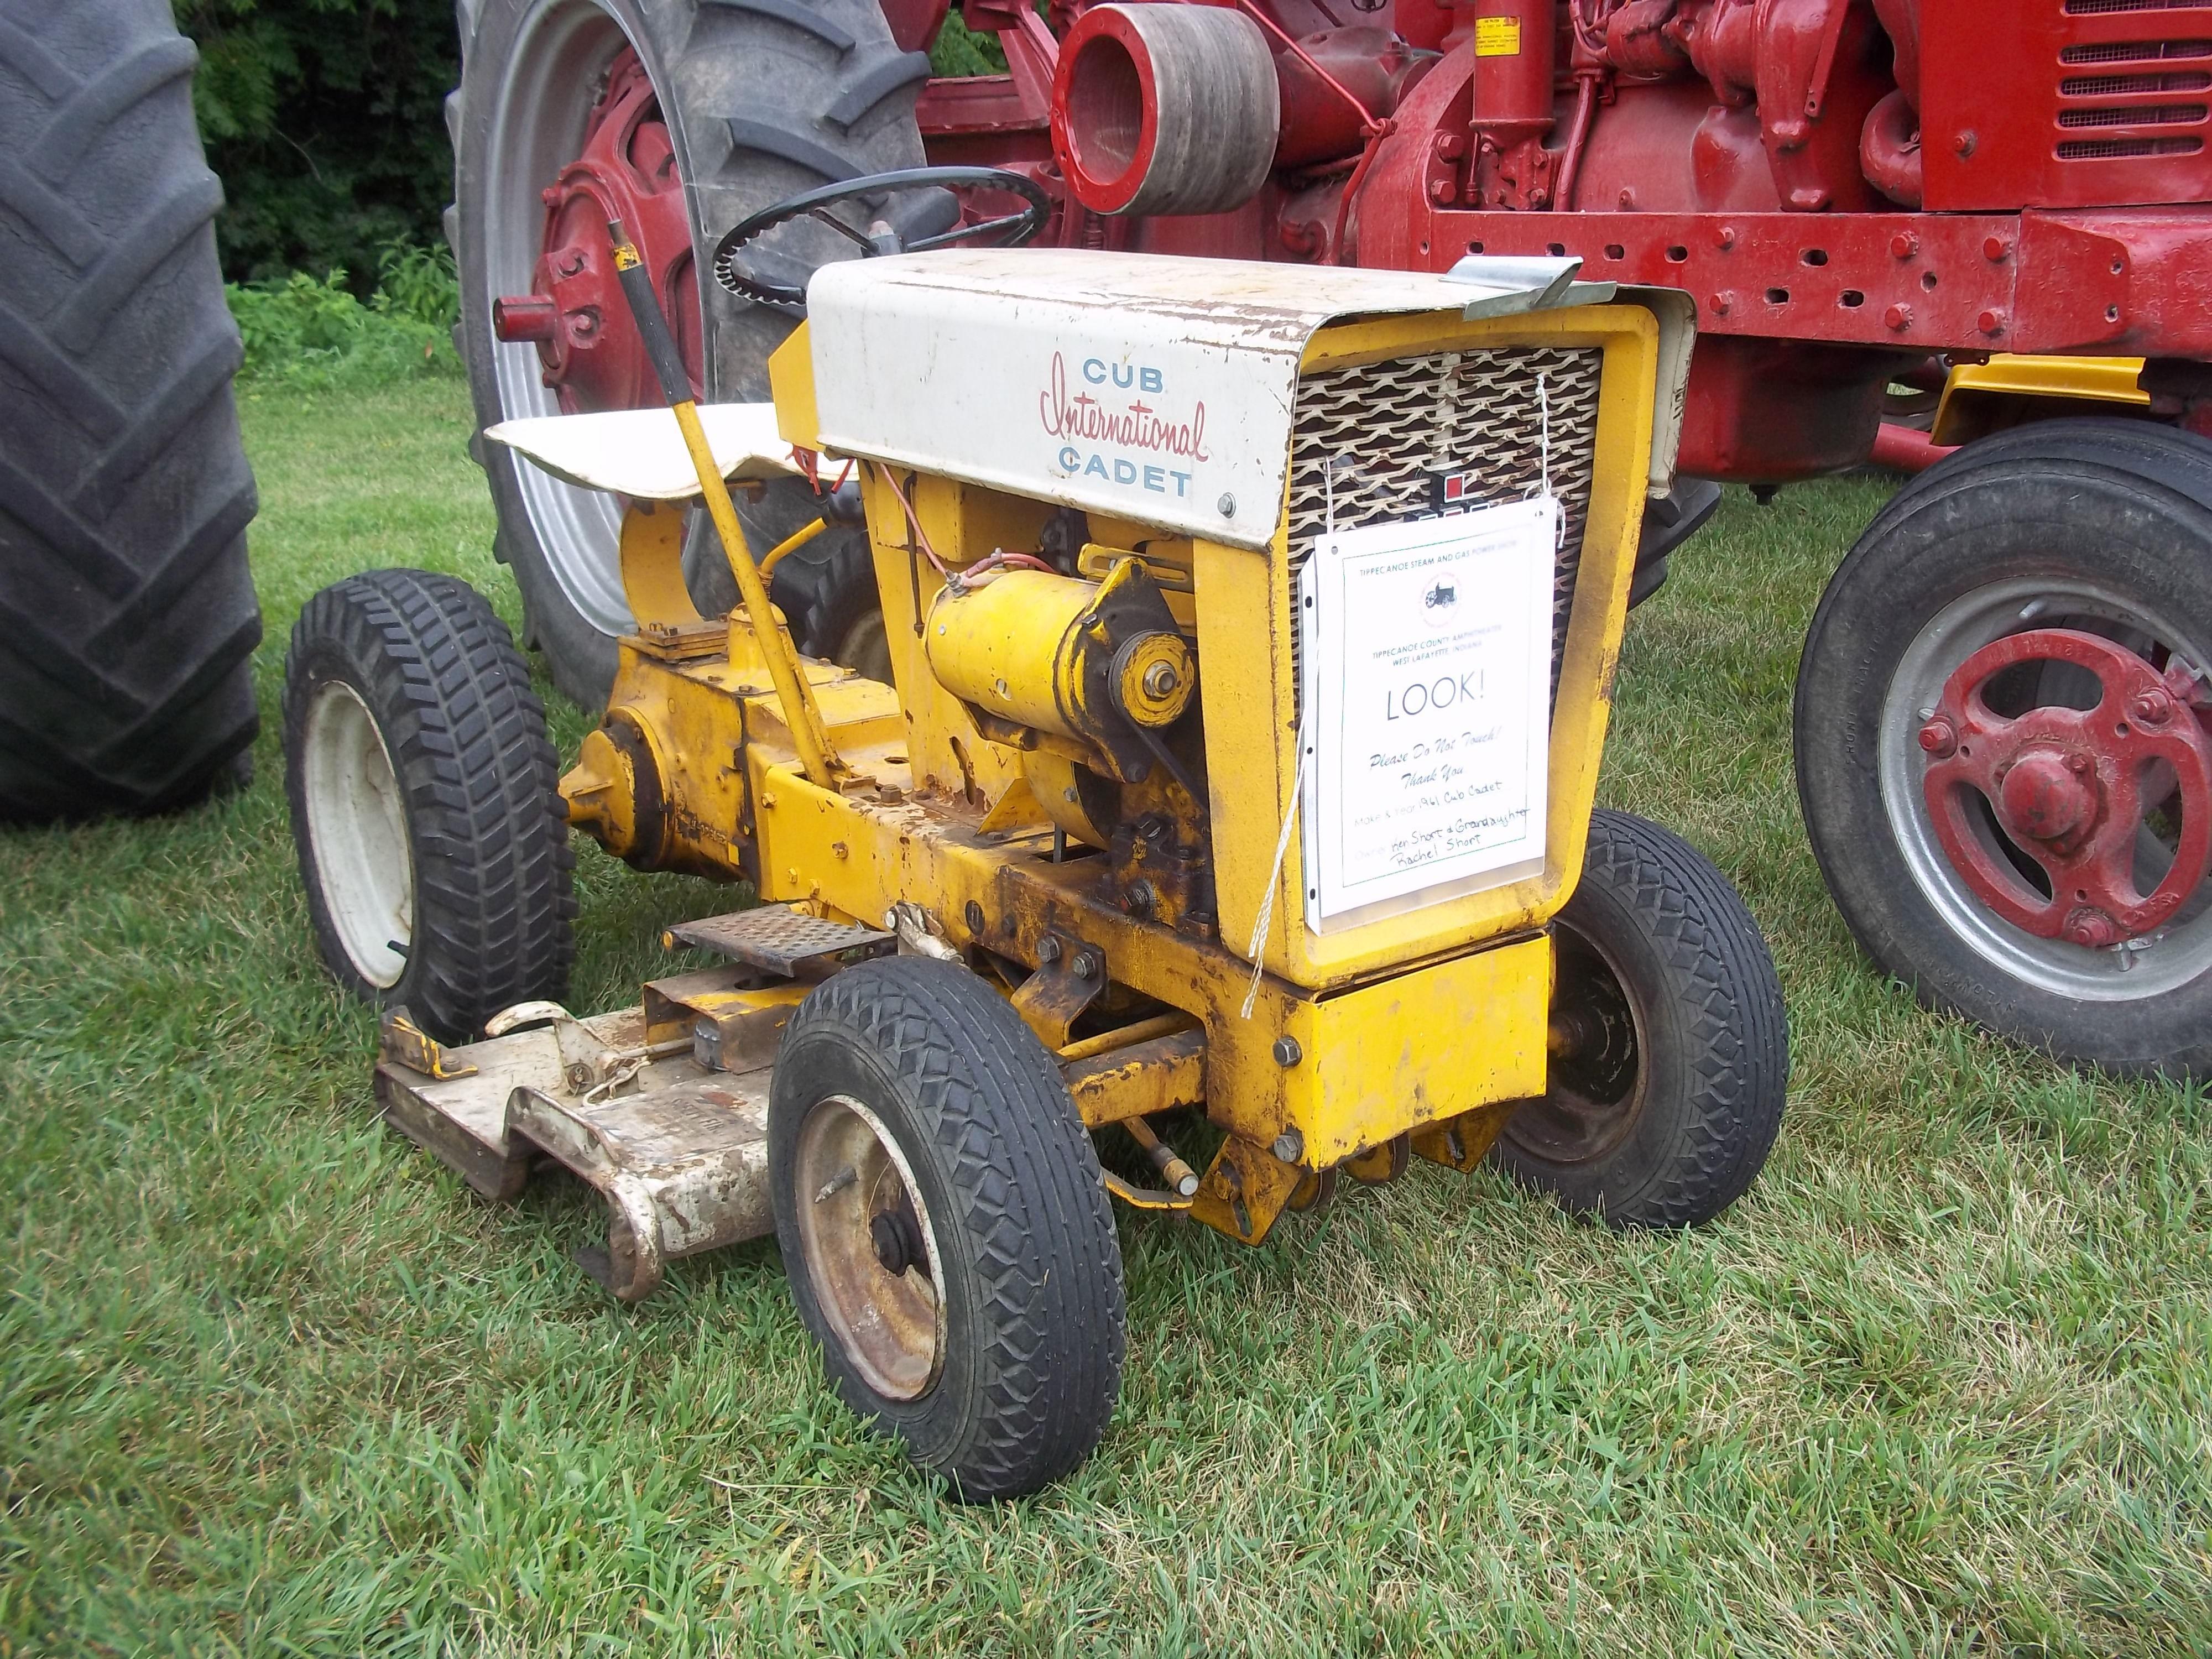 1960s Cub Cadet lawn garden tractor IH Farmall Pinterest